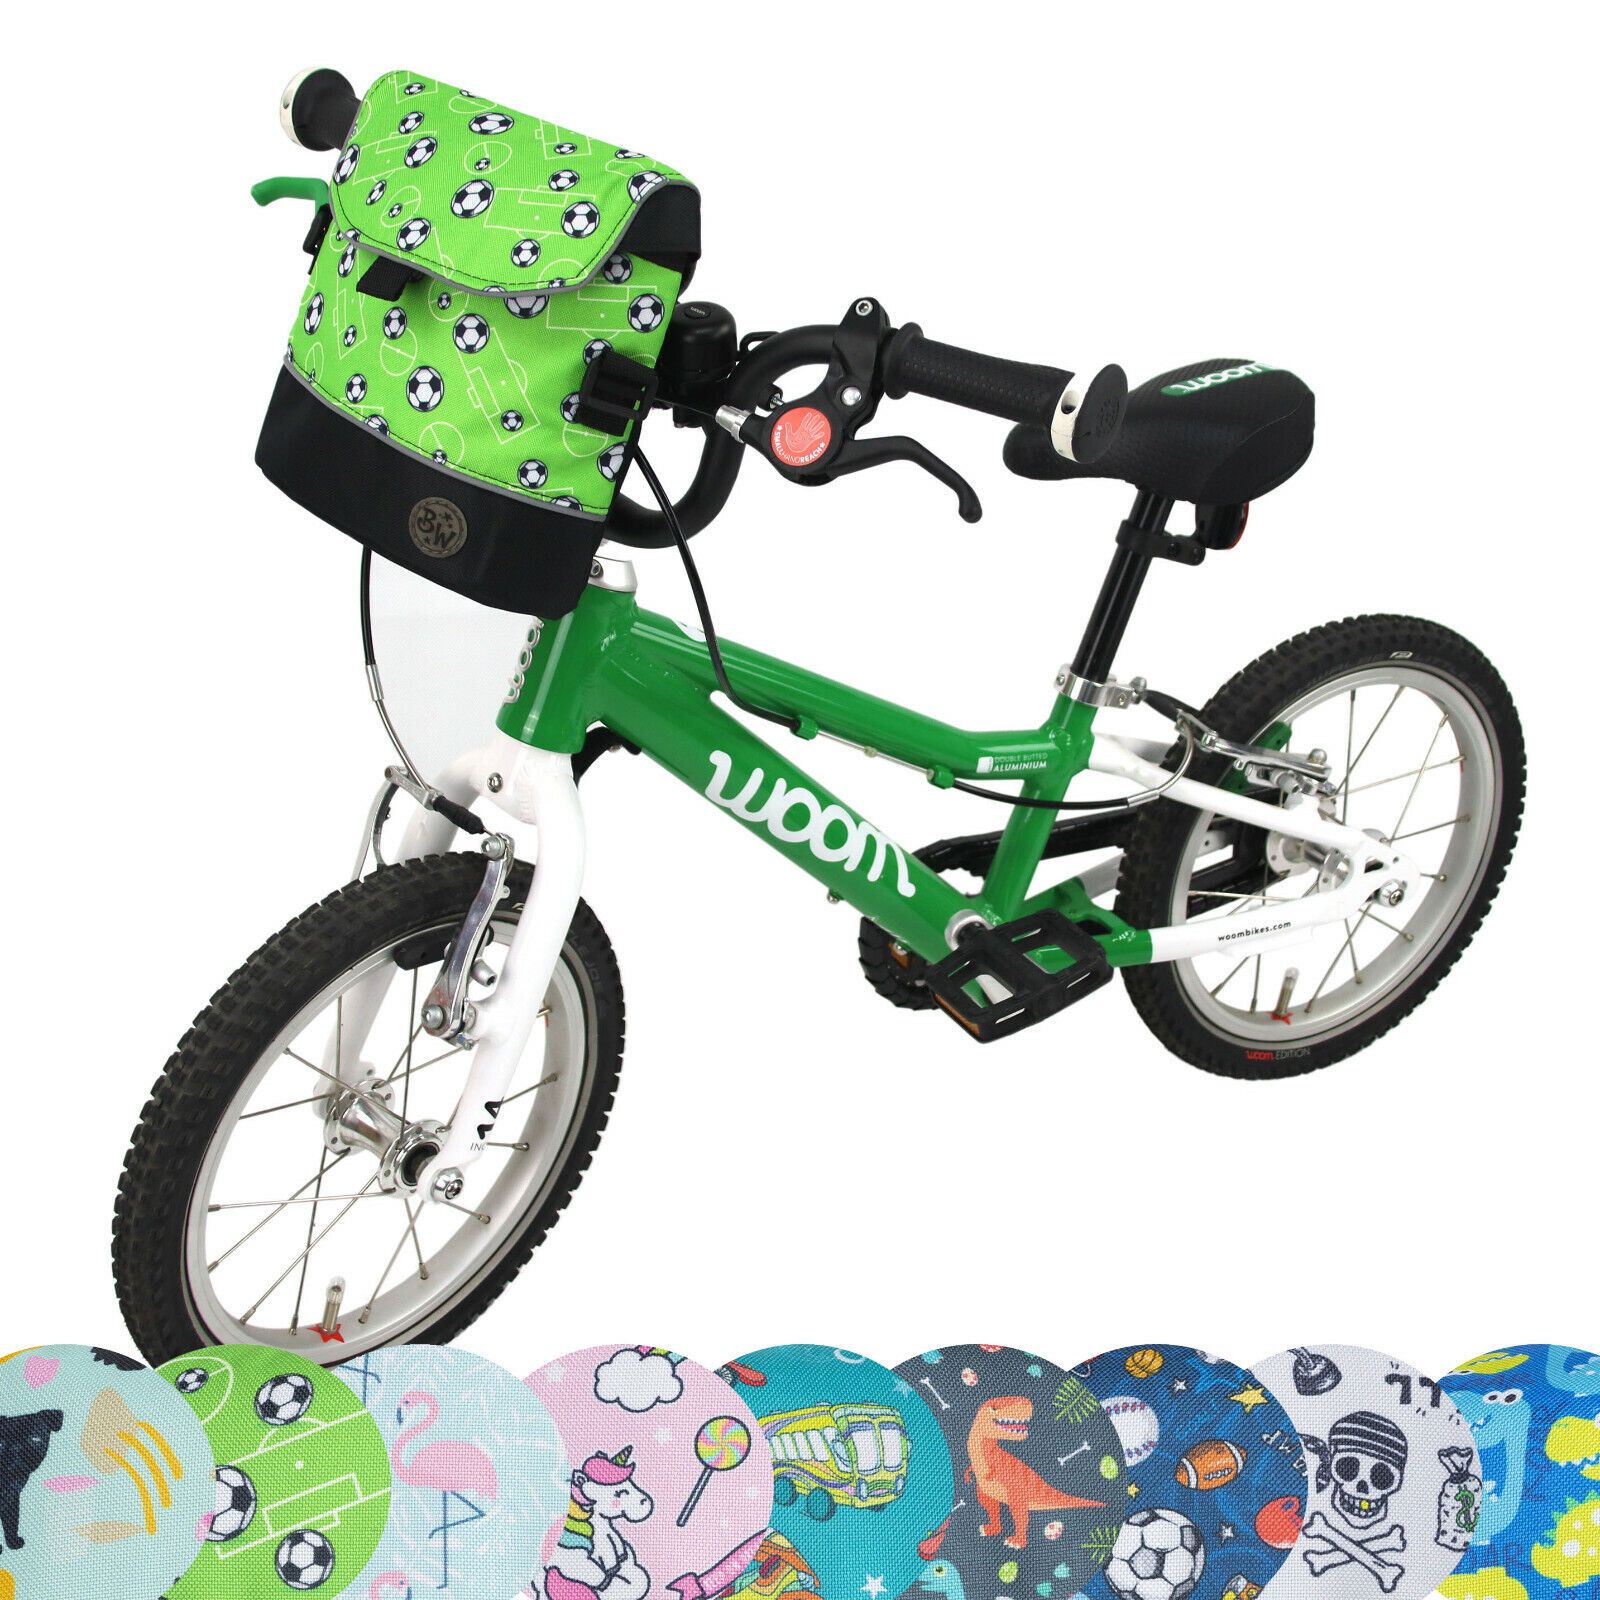 BAMBINIWELT Lenkertasche für Woom Fahrrad Roller Scooter Kinder Fahrradtasche